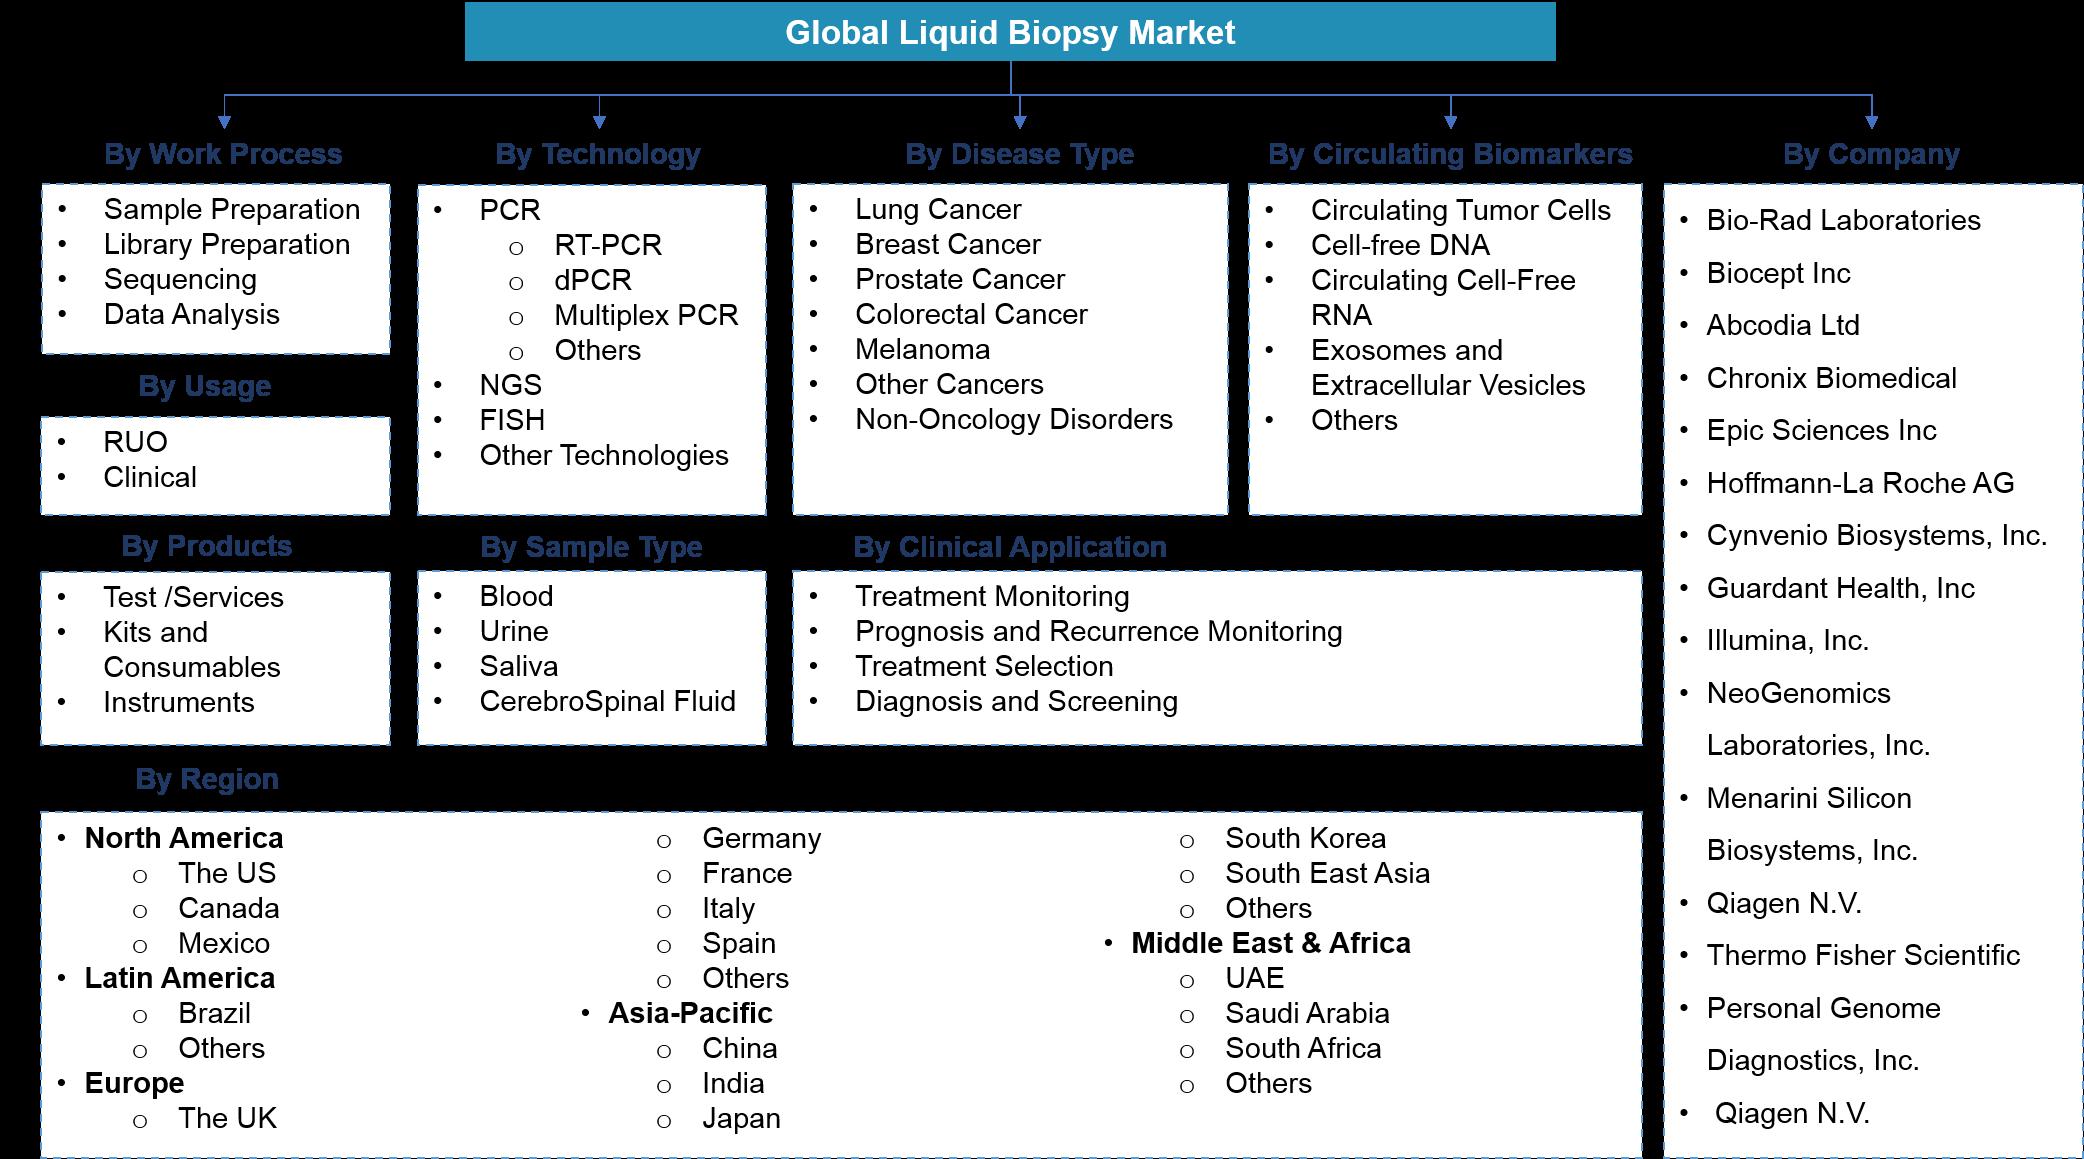 Global Liquid Biopsy Market Segmentation